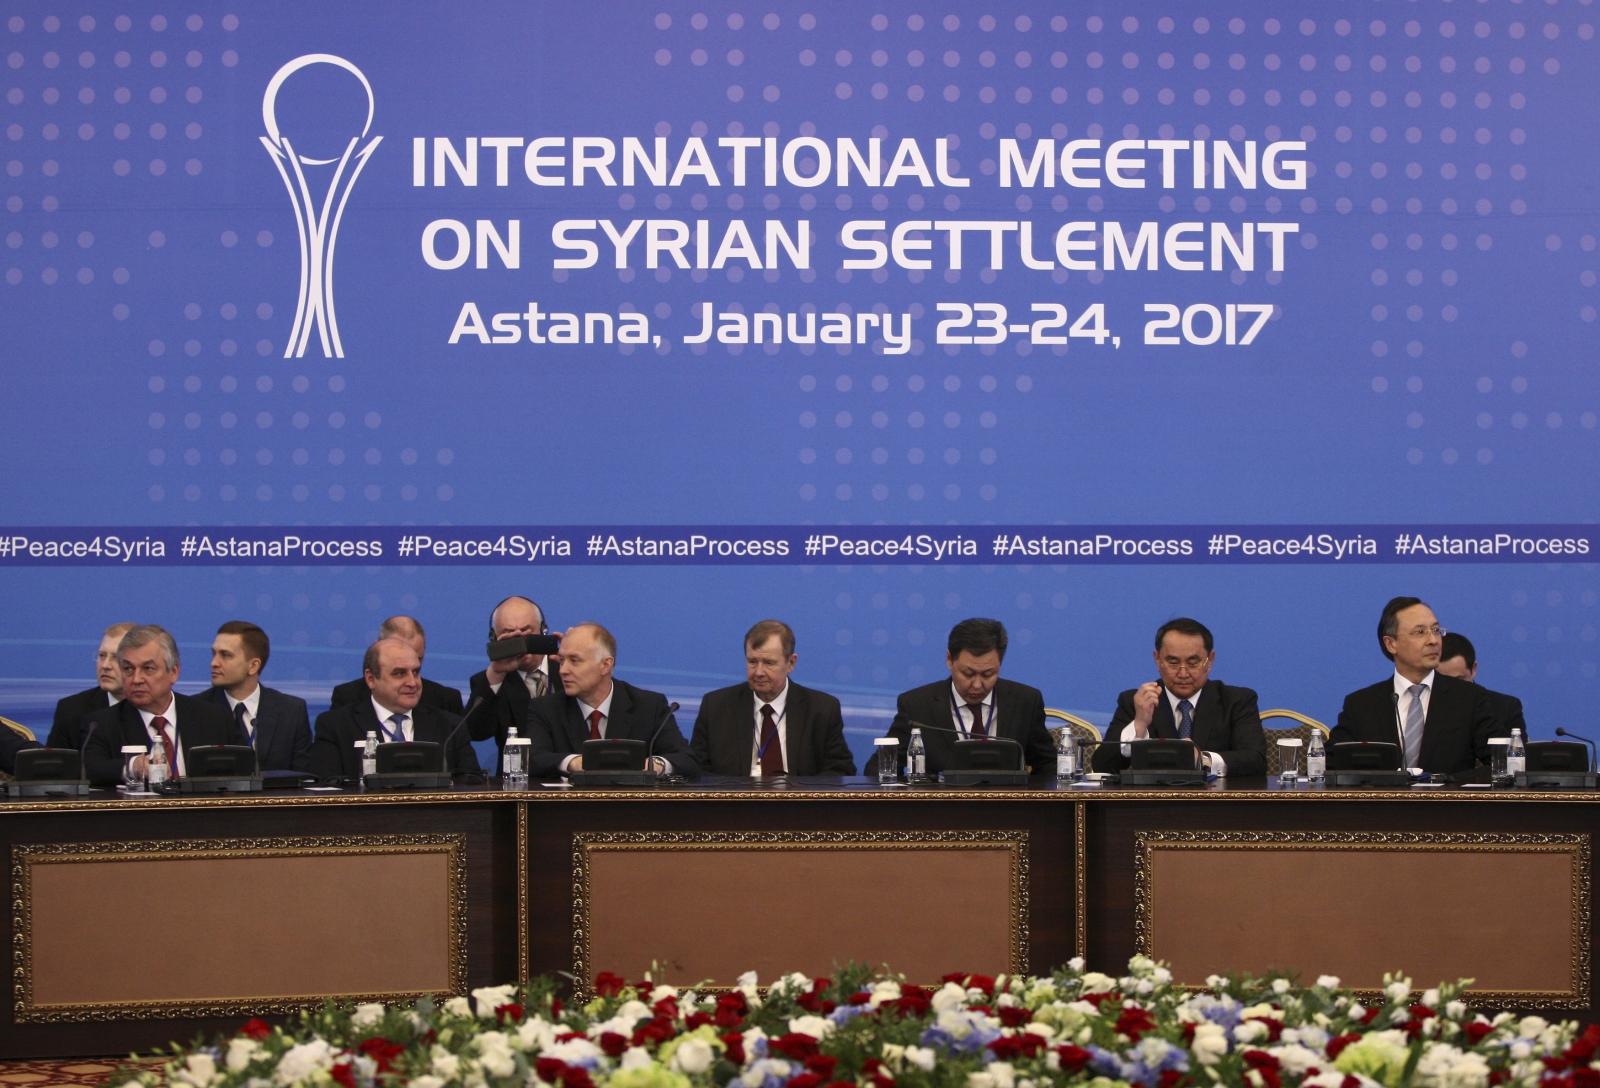 Participants of Syria peace talks